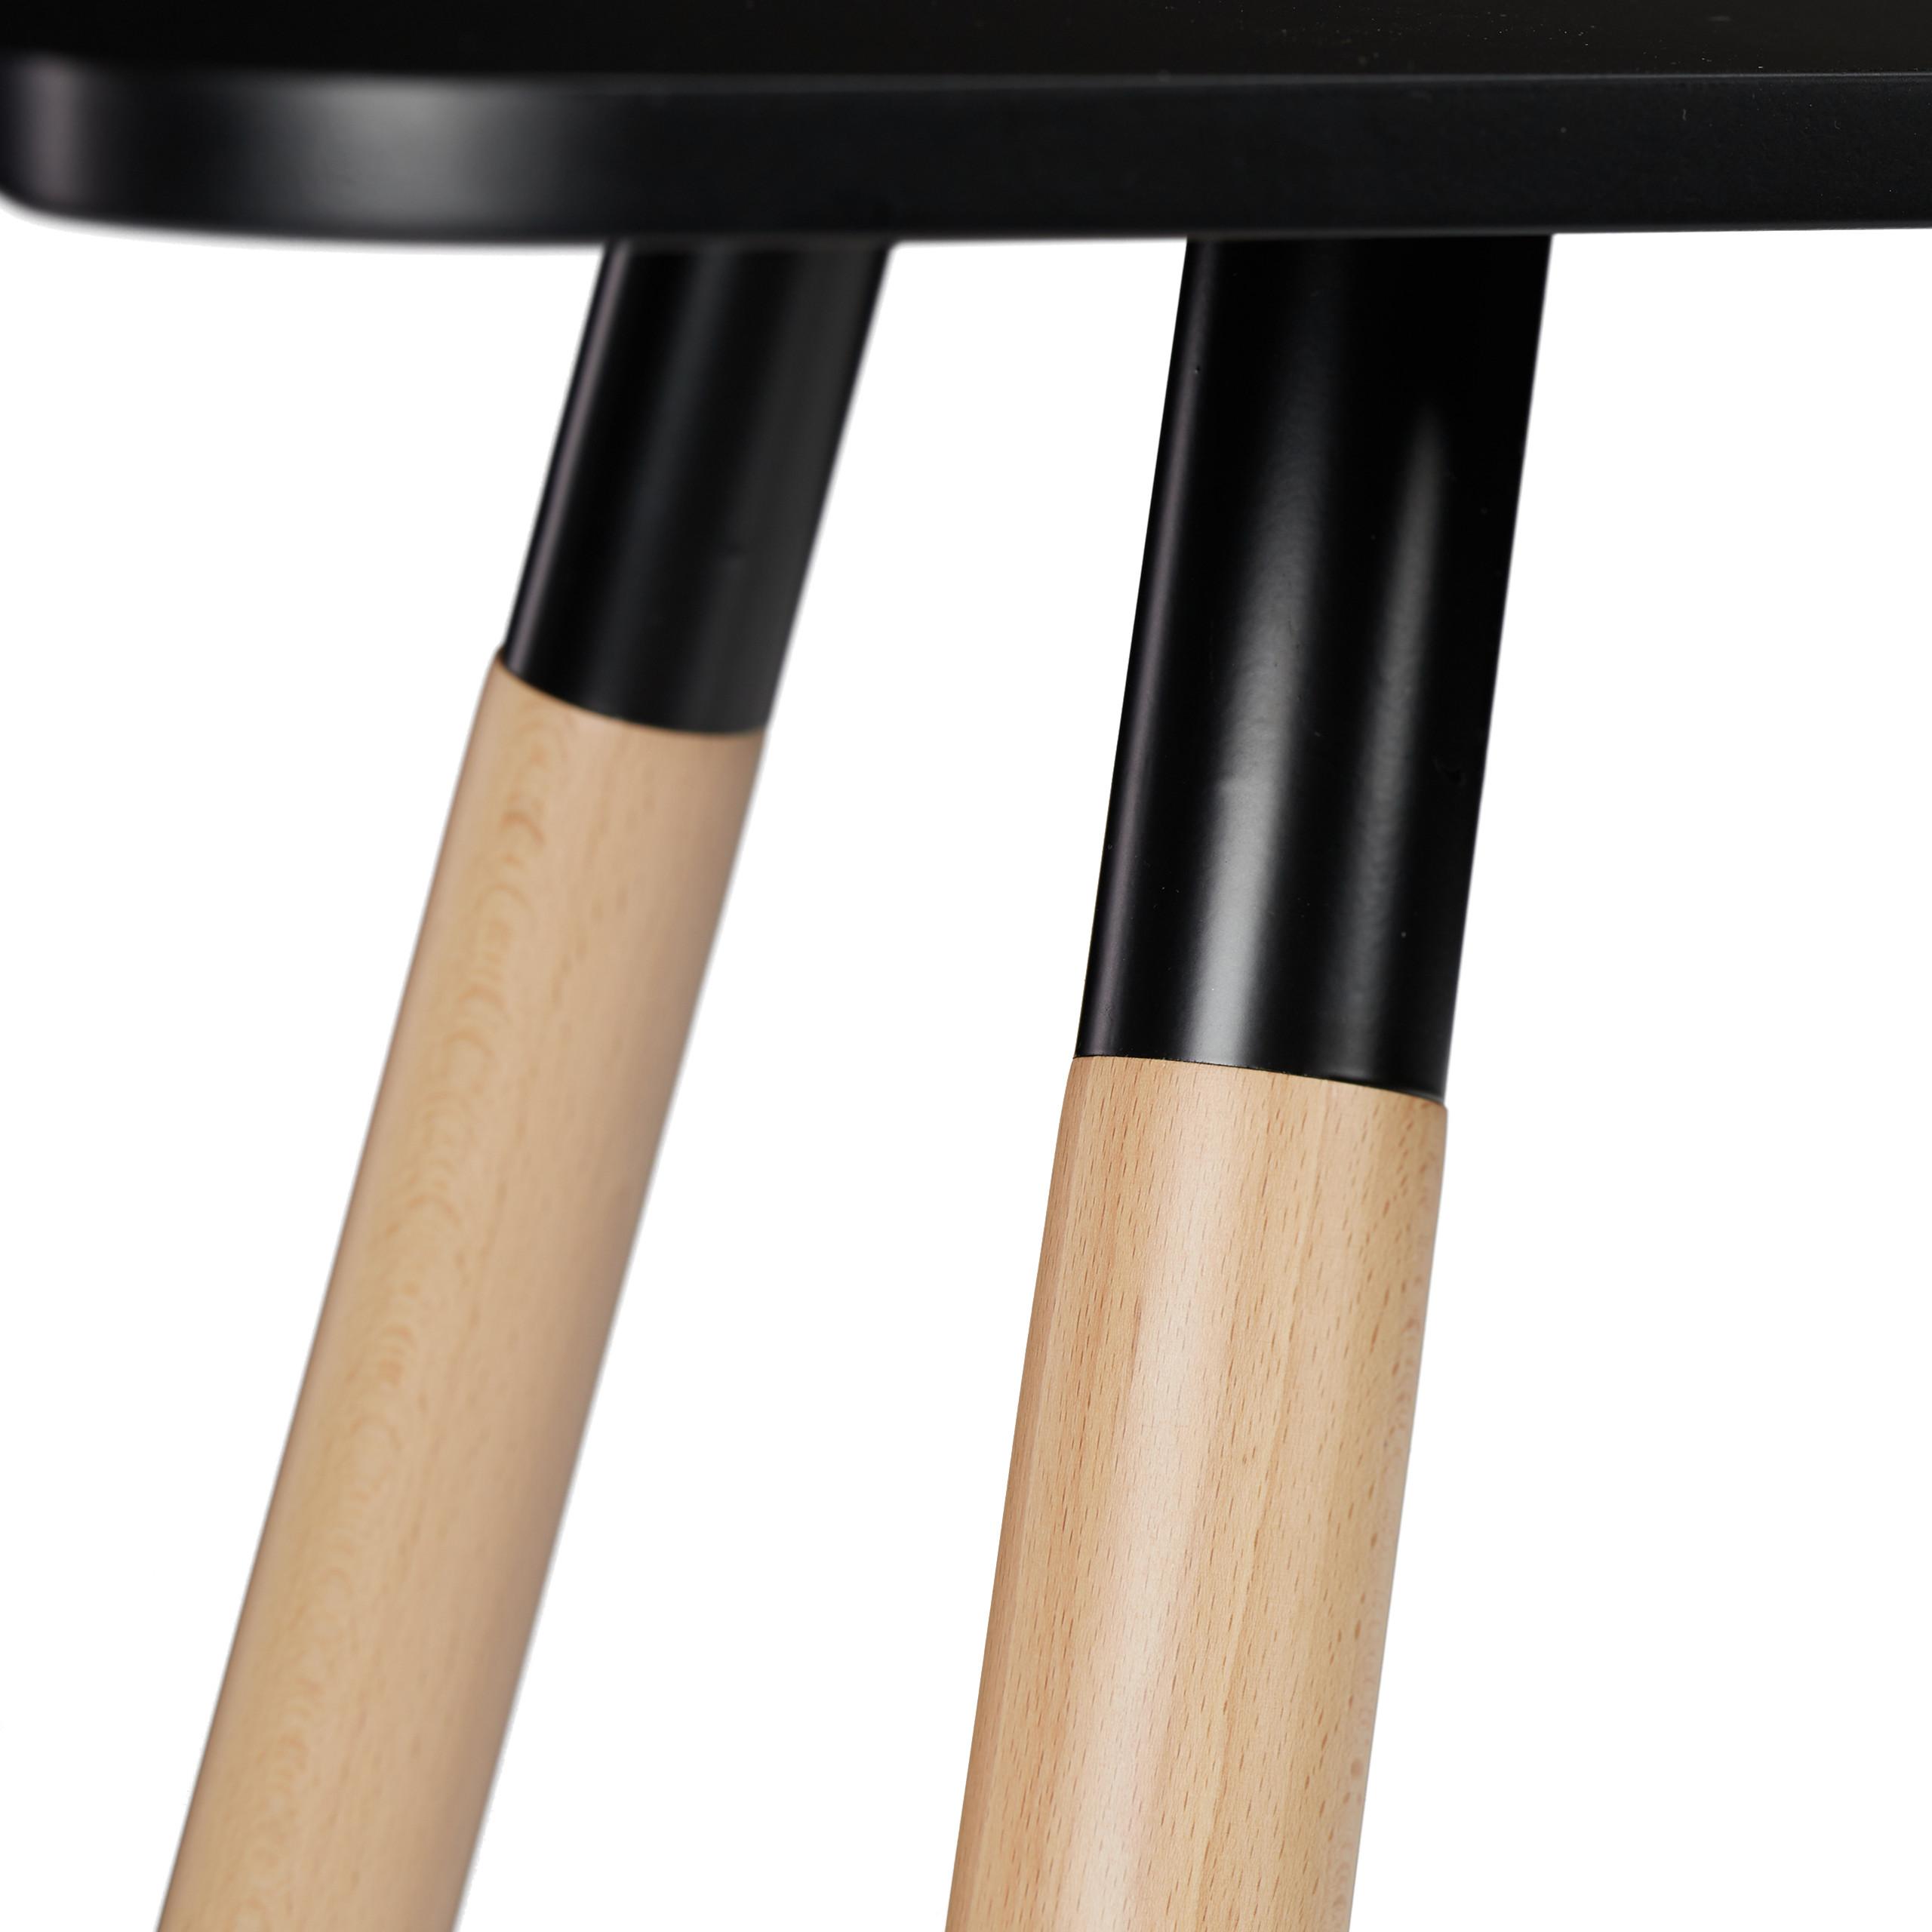 bureau-kinderbureau-ruimtebesparend-75-cm-hoog-laptoptafel-120-breed miniatuur 18